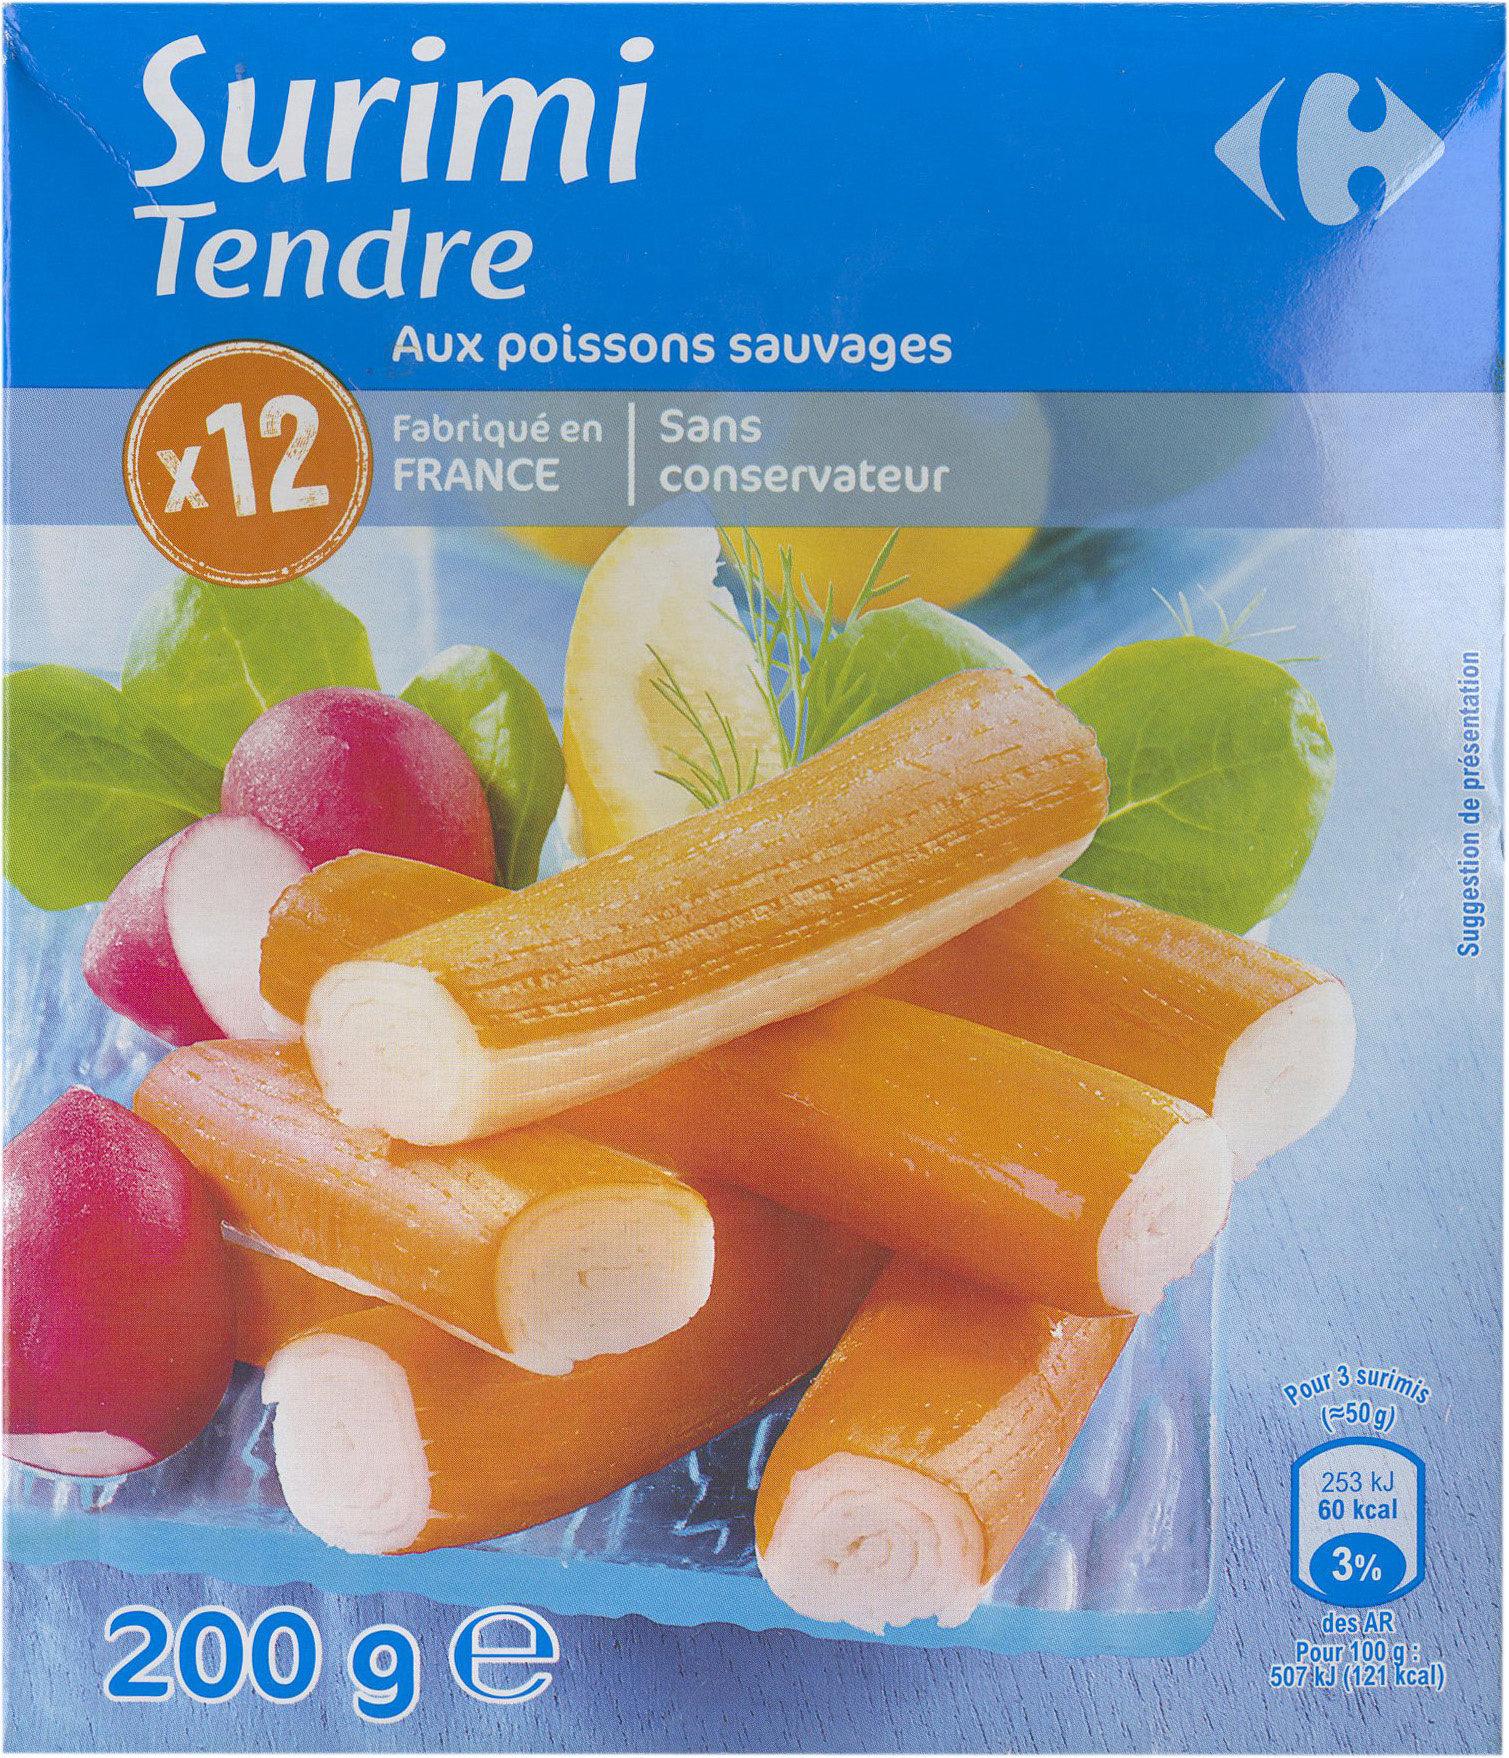 Surimi tendre - Product - fr